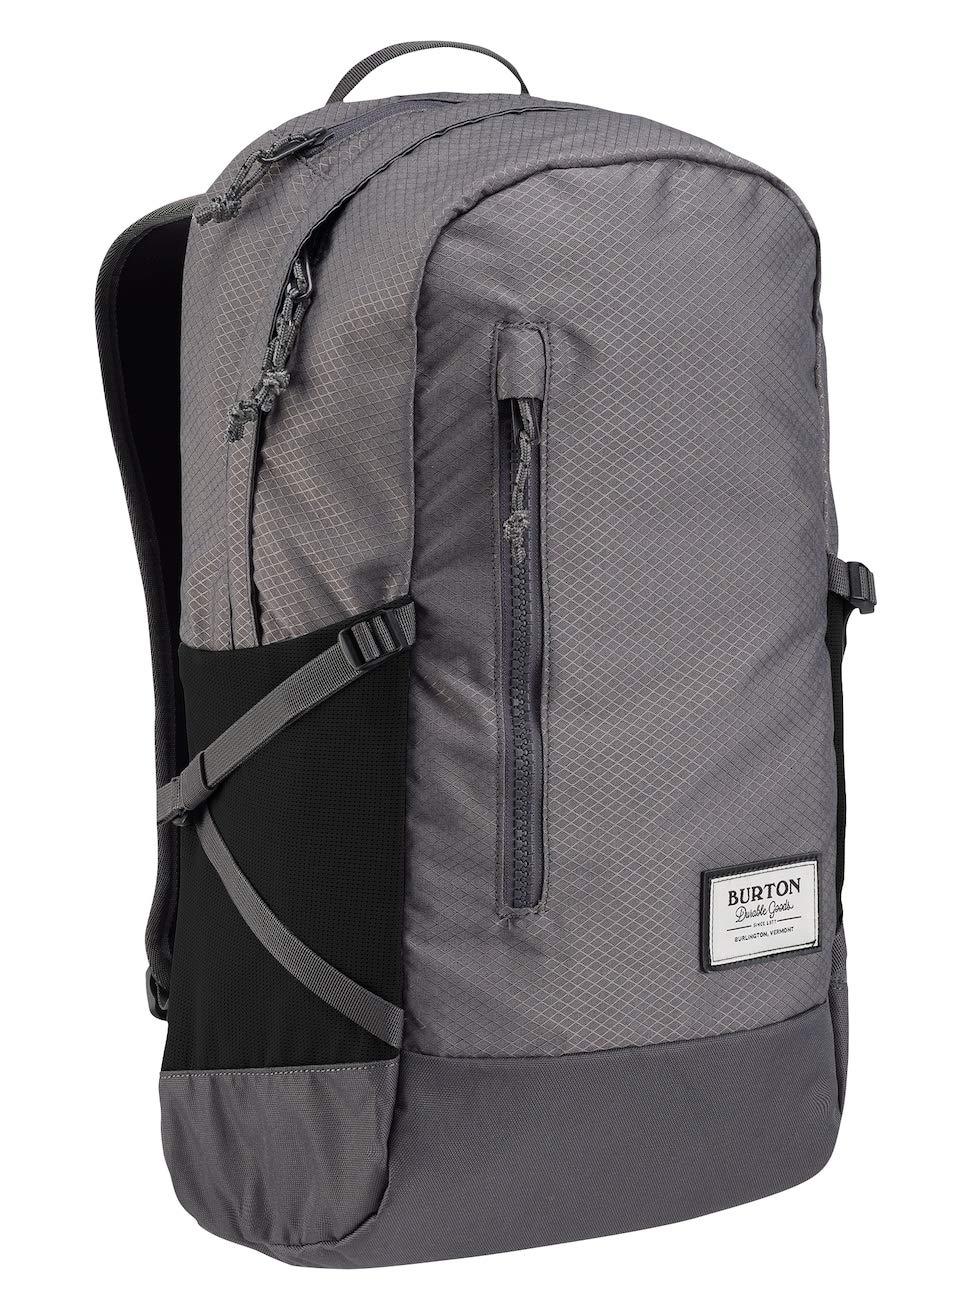 Burton Prospect Daypack BRRS5|#Burton